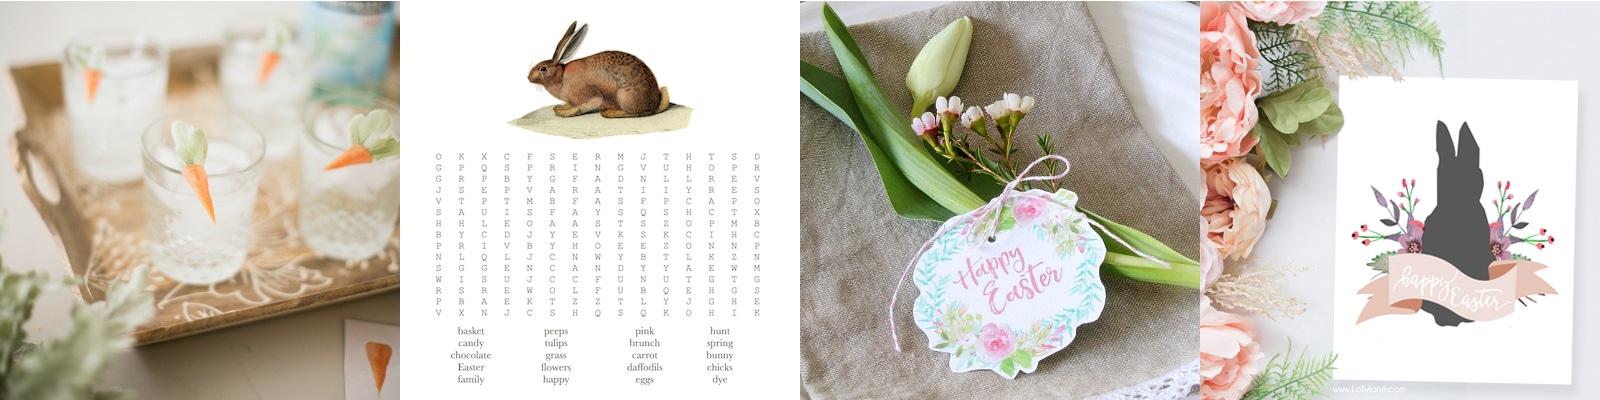 29 Free Easter Decor Printables